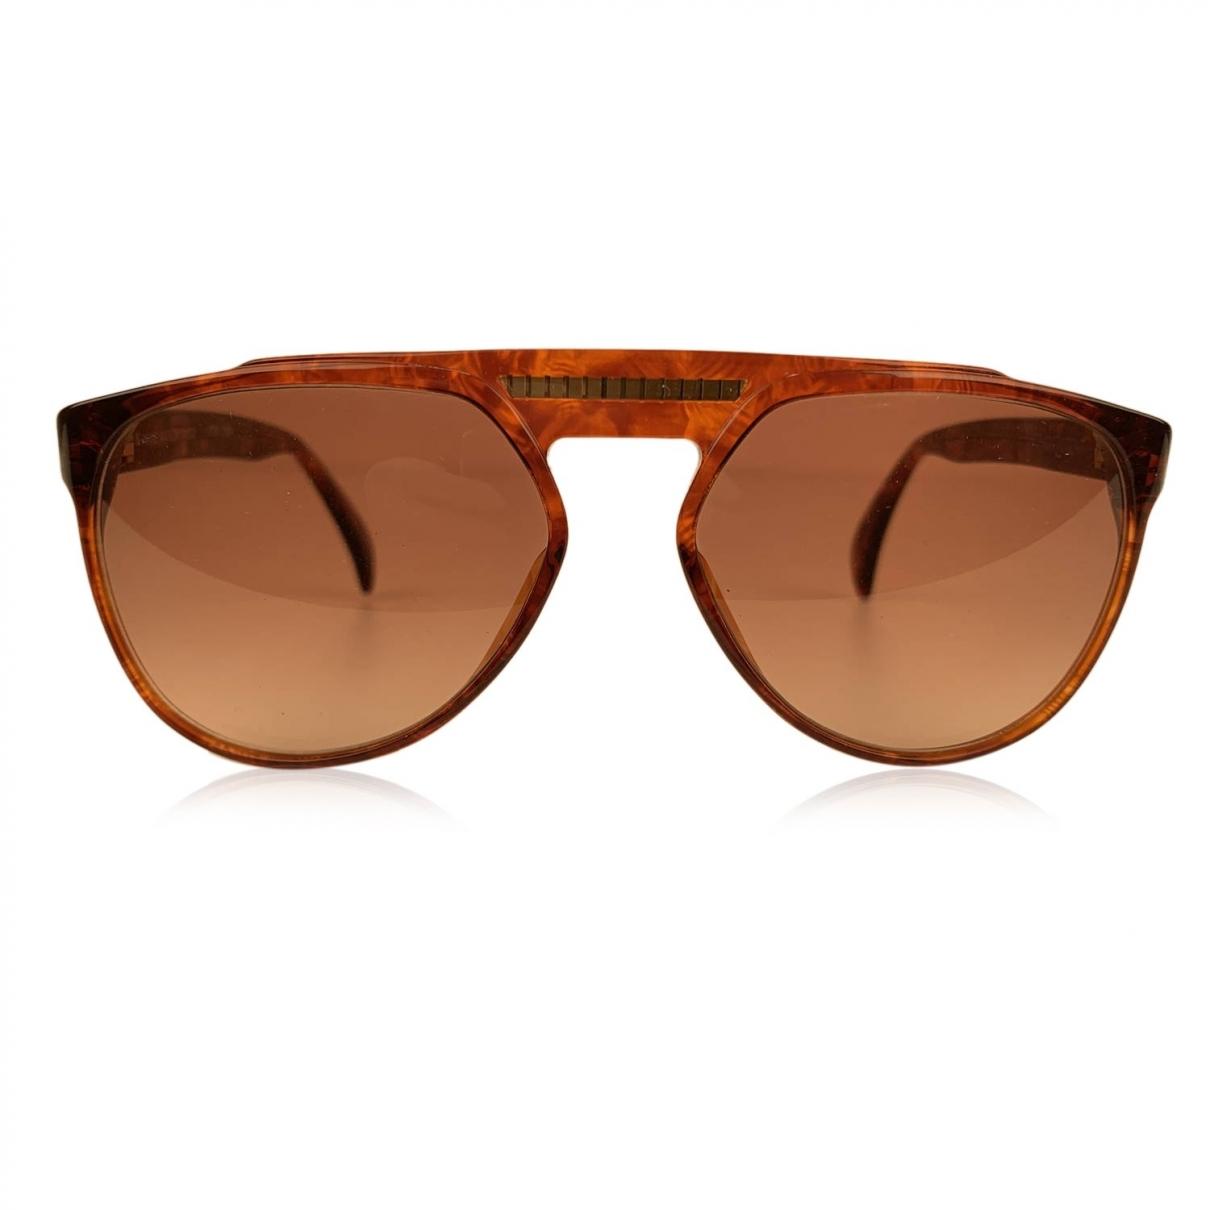 Yves Saint Laurent \N Brown Sunglasses for Women \N